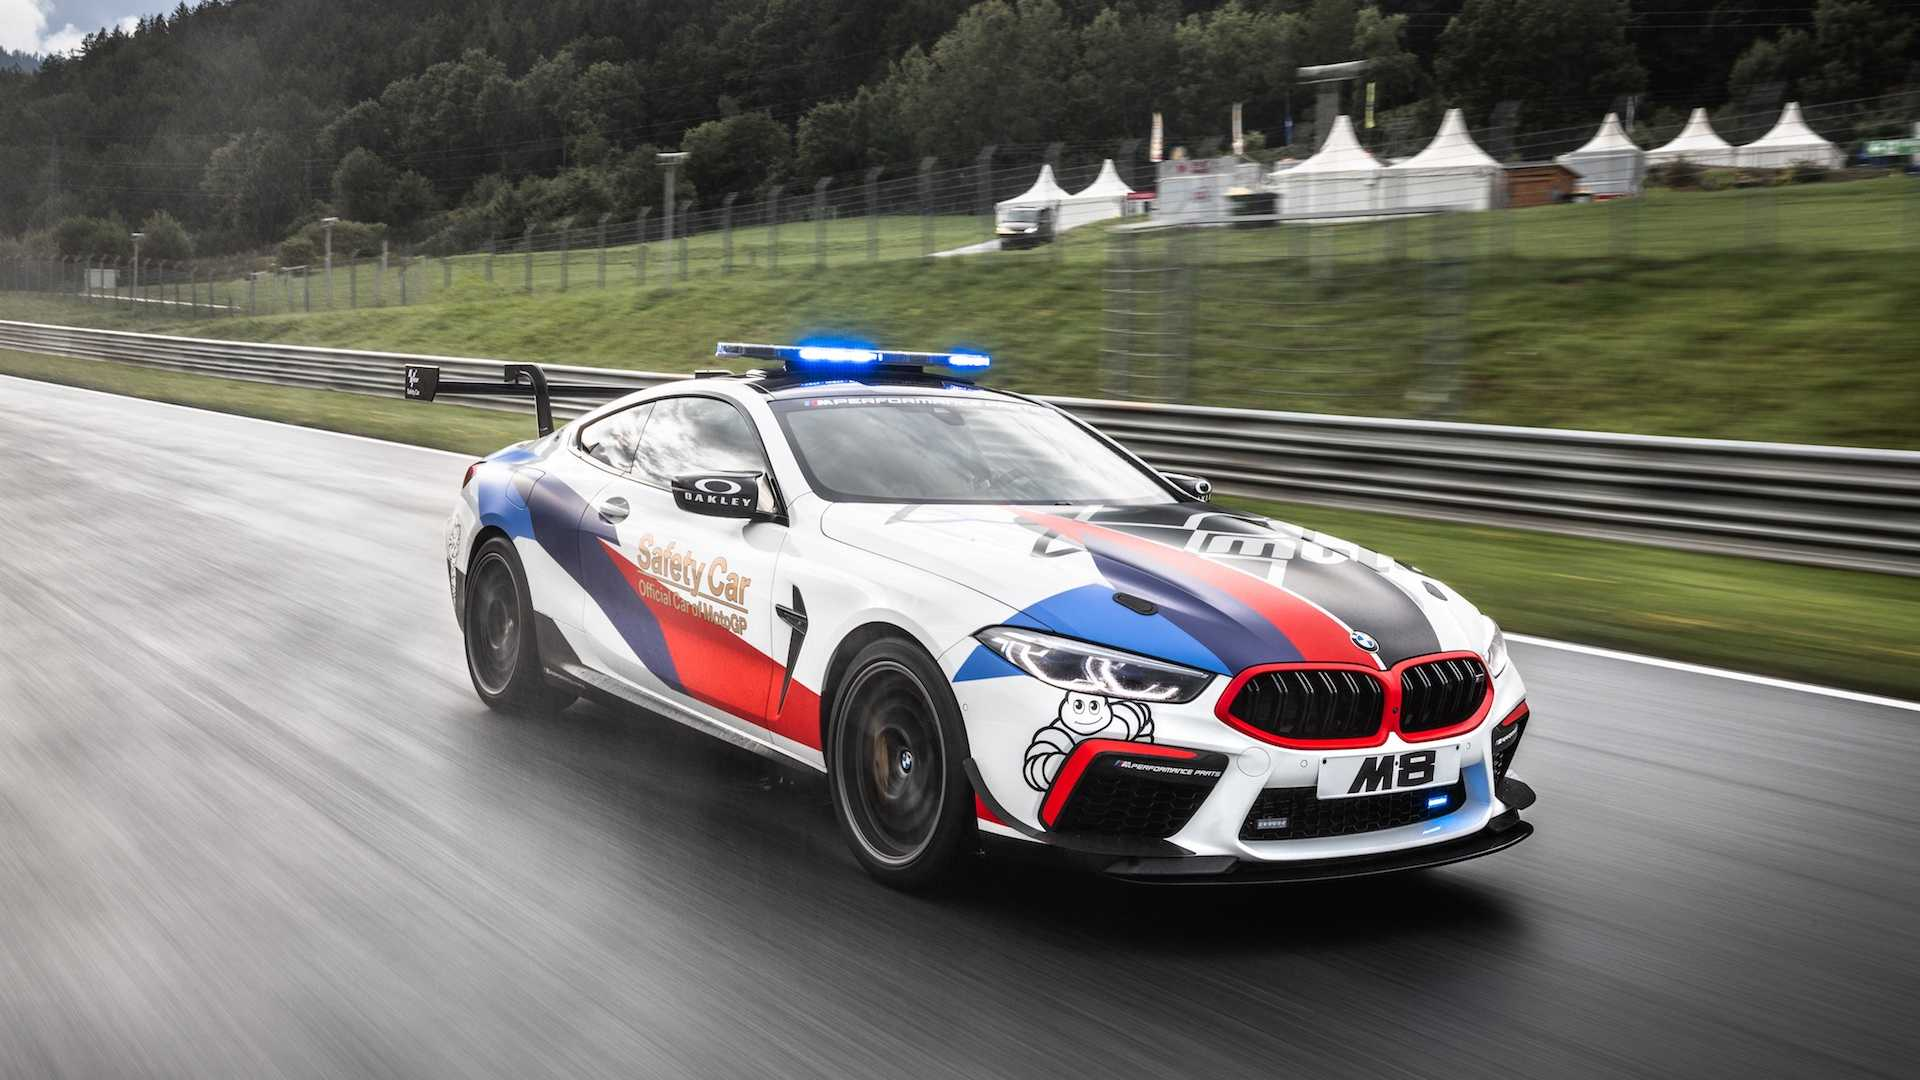 BMW M8 Competition novi MotoGP bezbednosni automobil (GALERIJA)